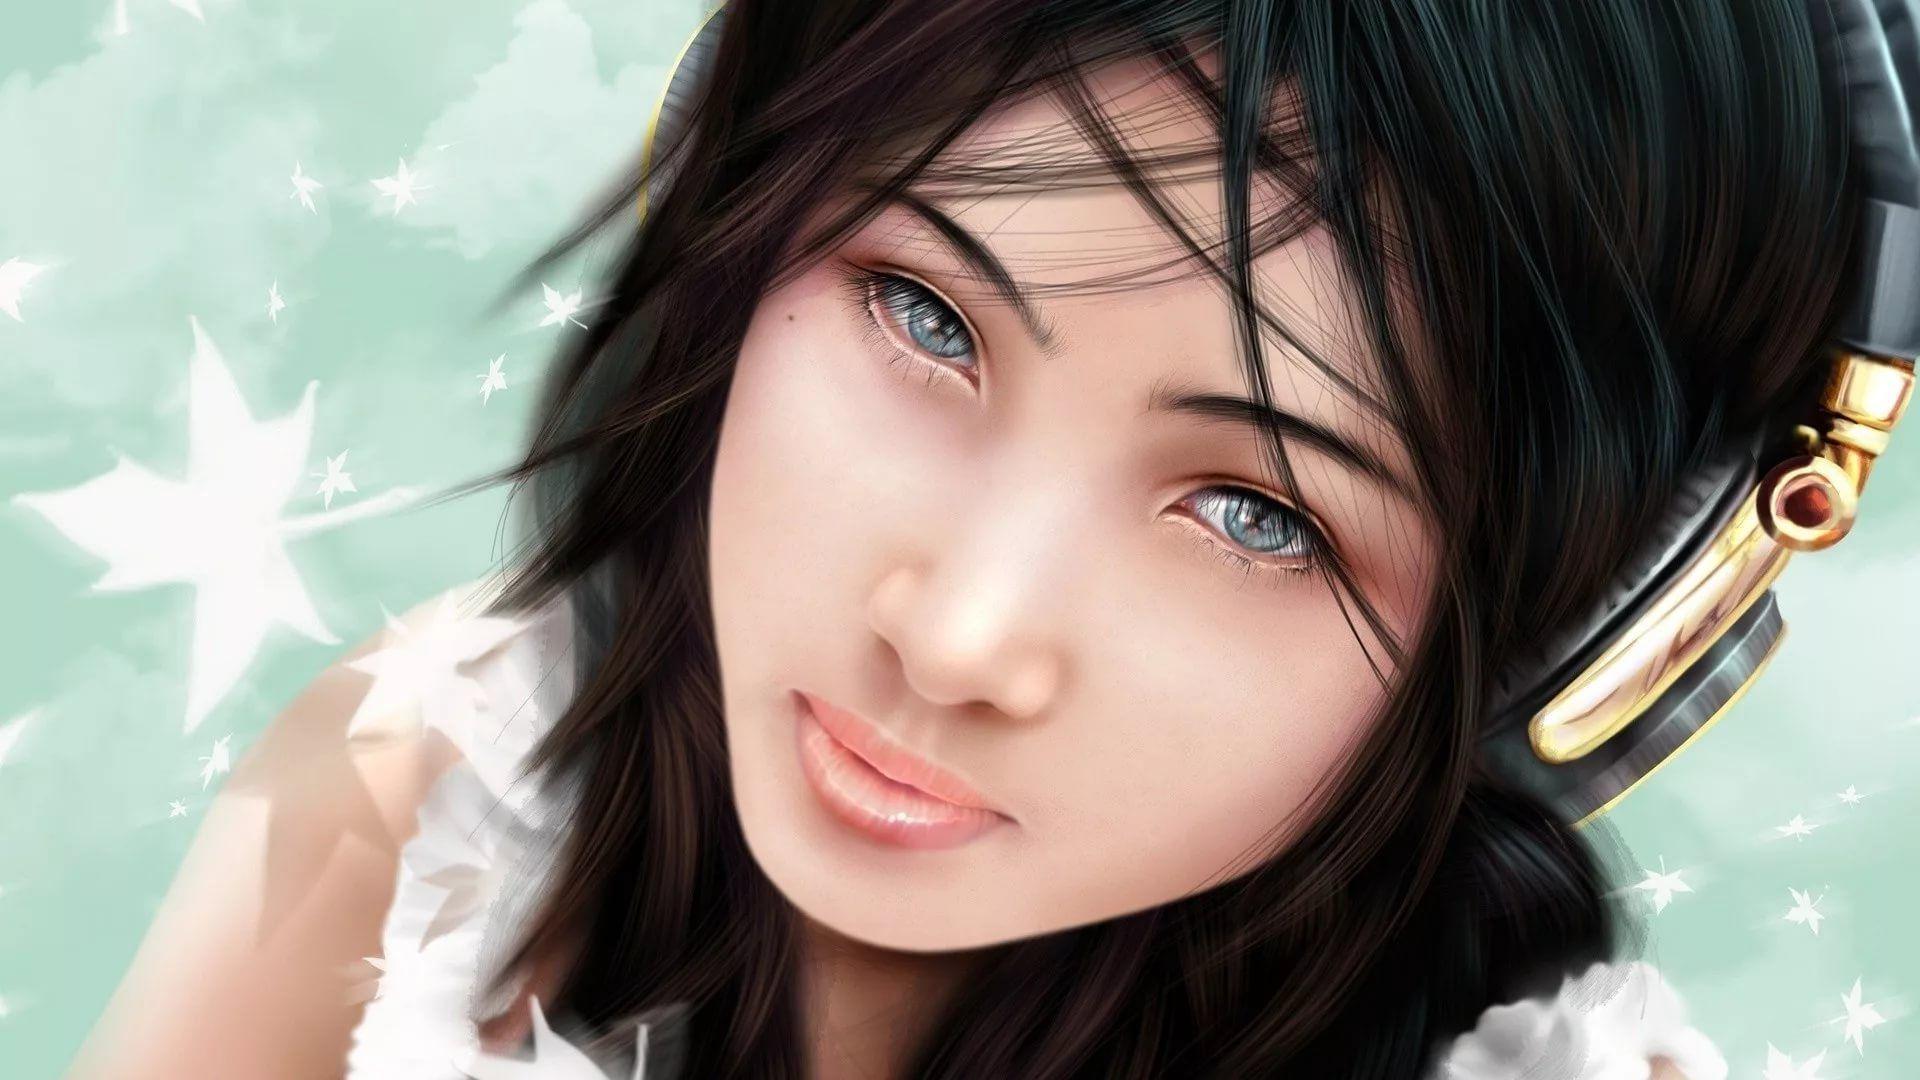 3D Girl pc wallpaper